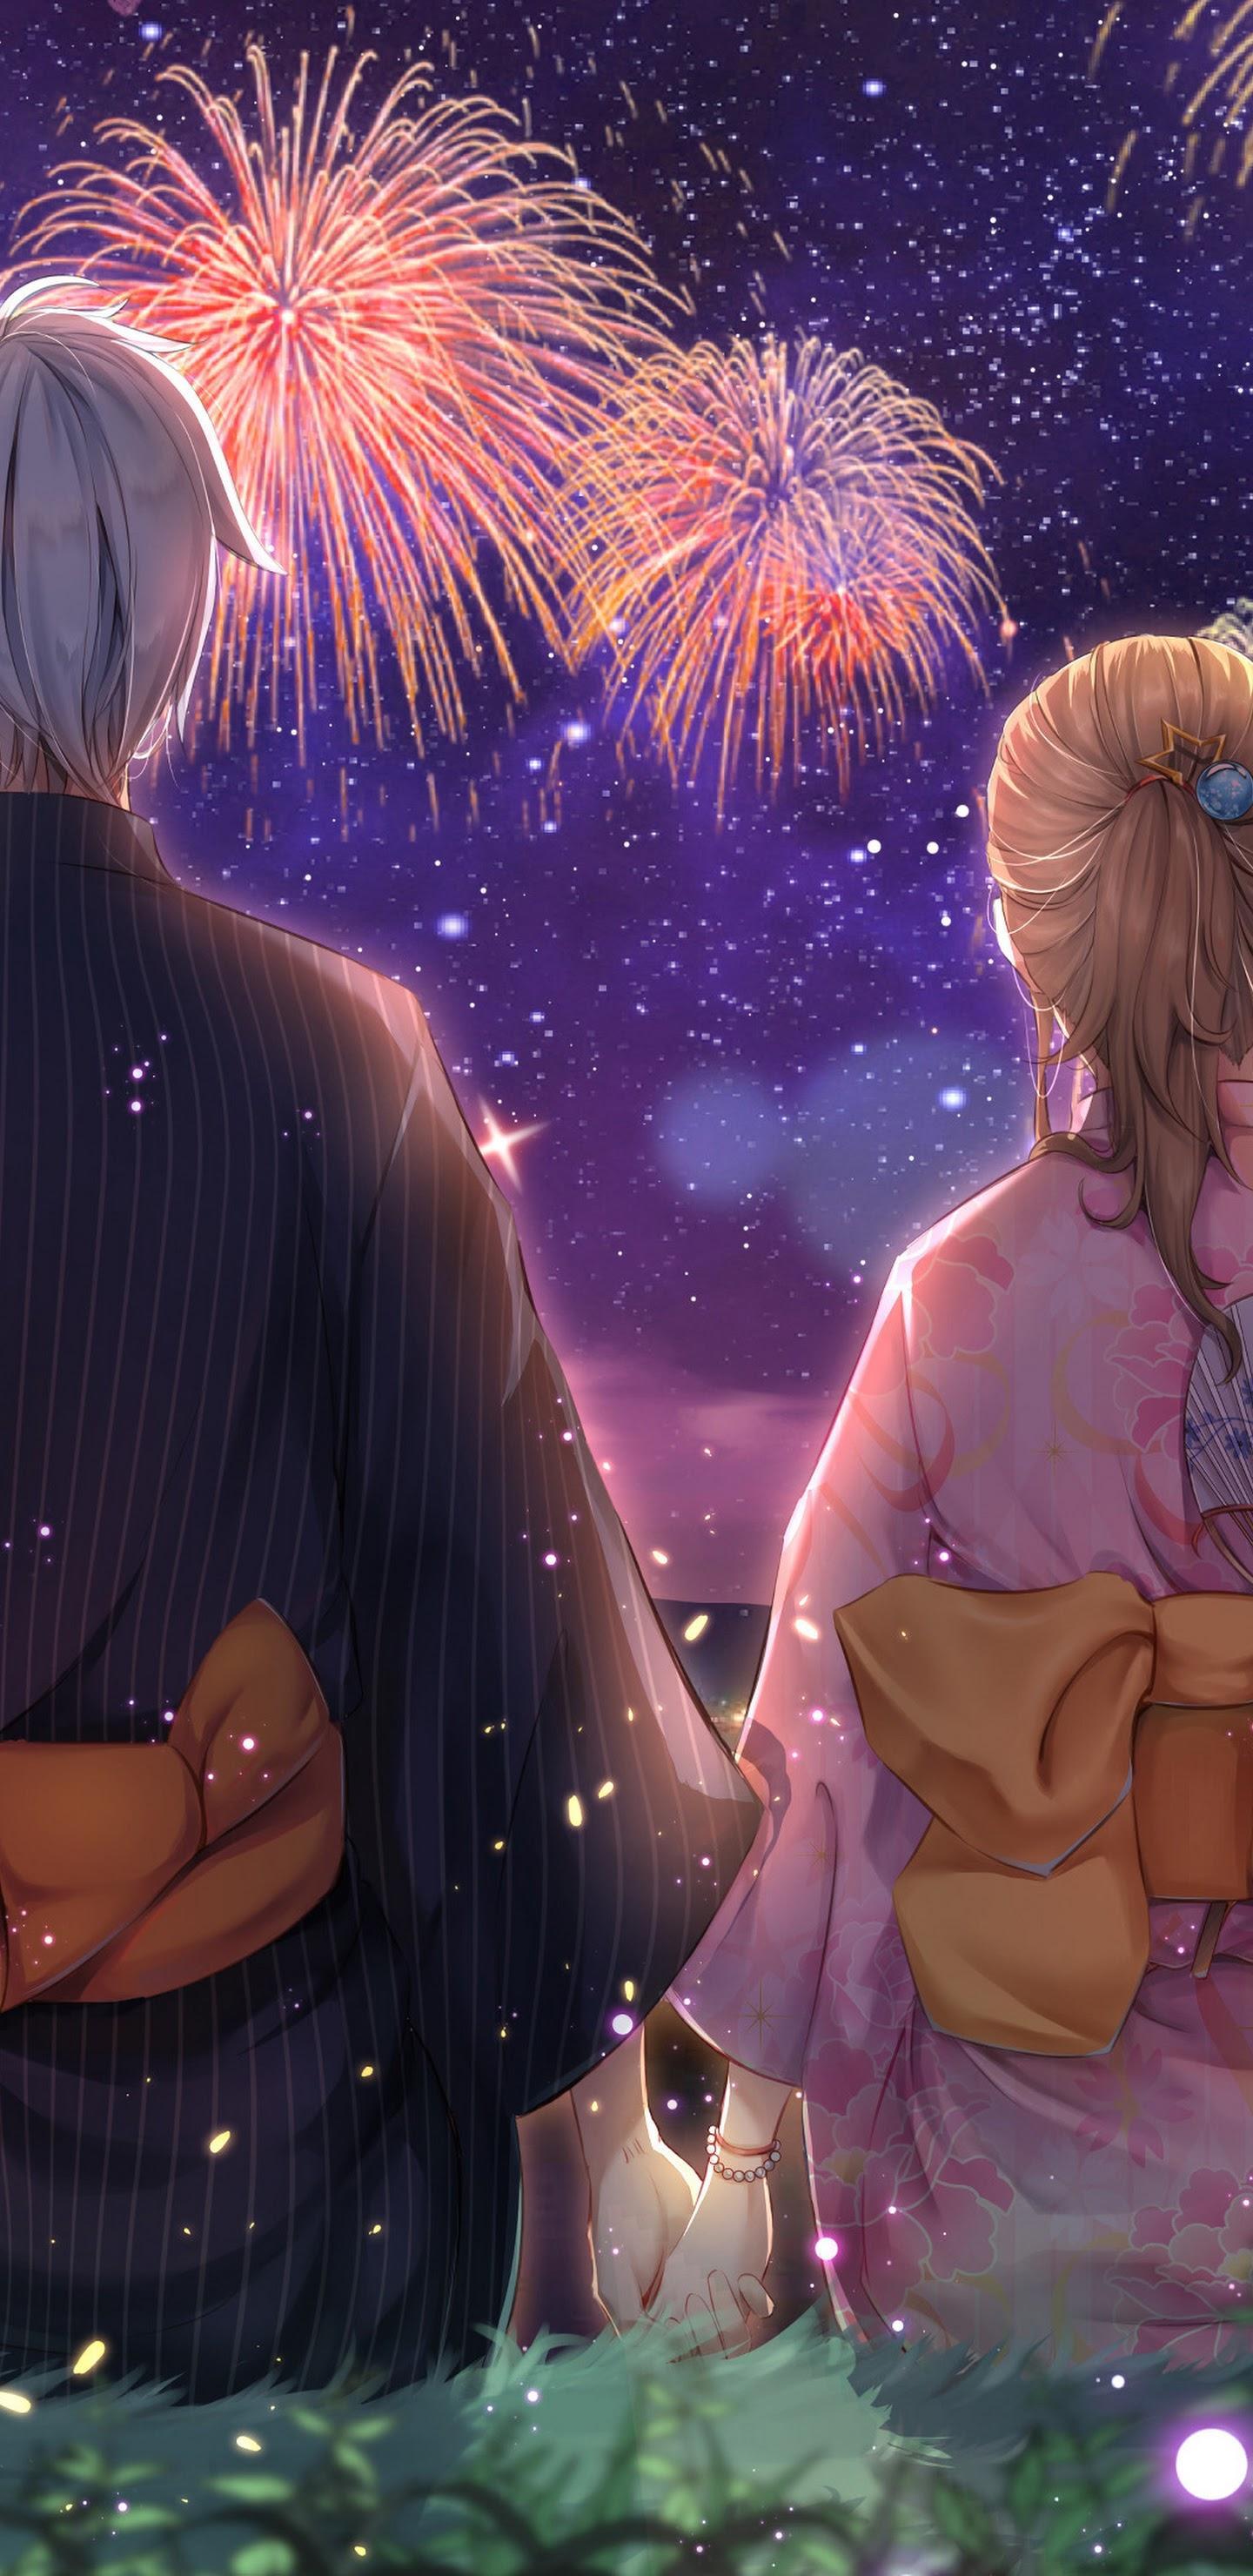 Anime Firework 4K Wallpapers - Wallpaper Cave